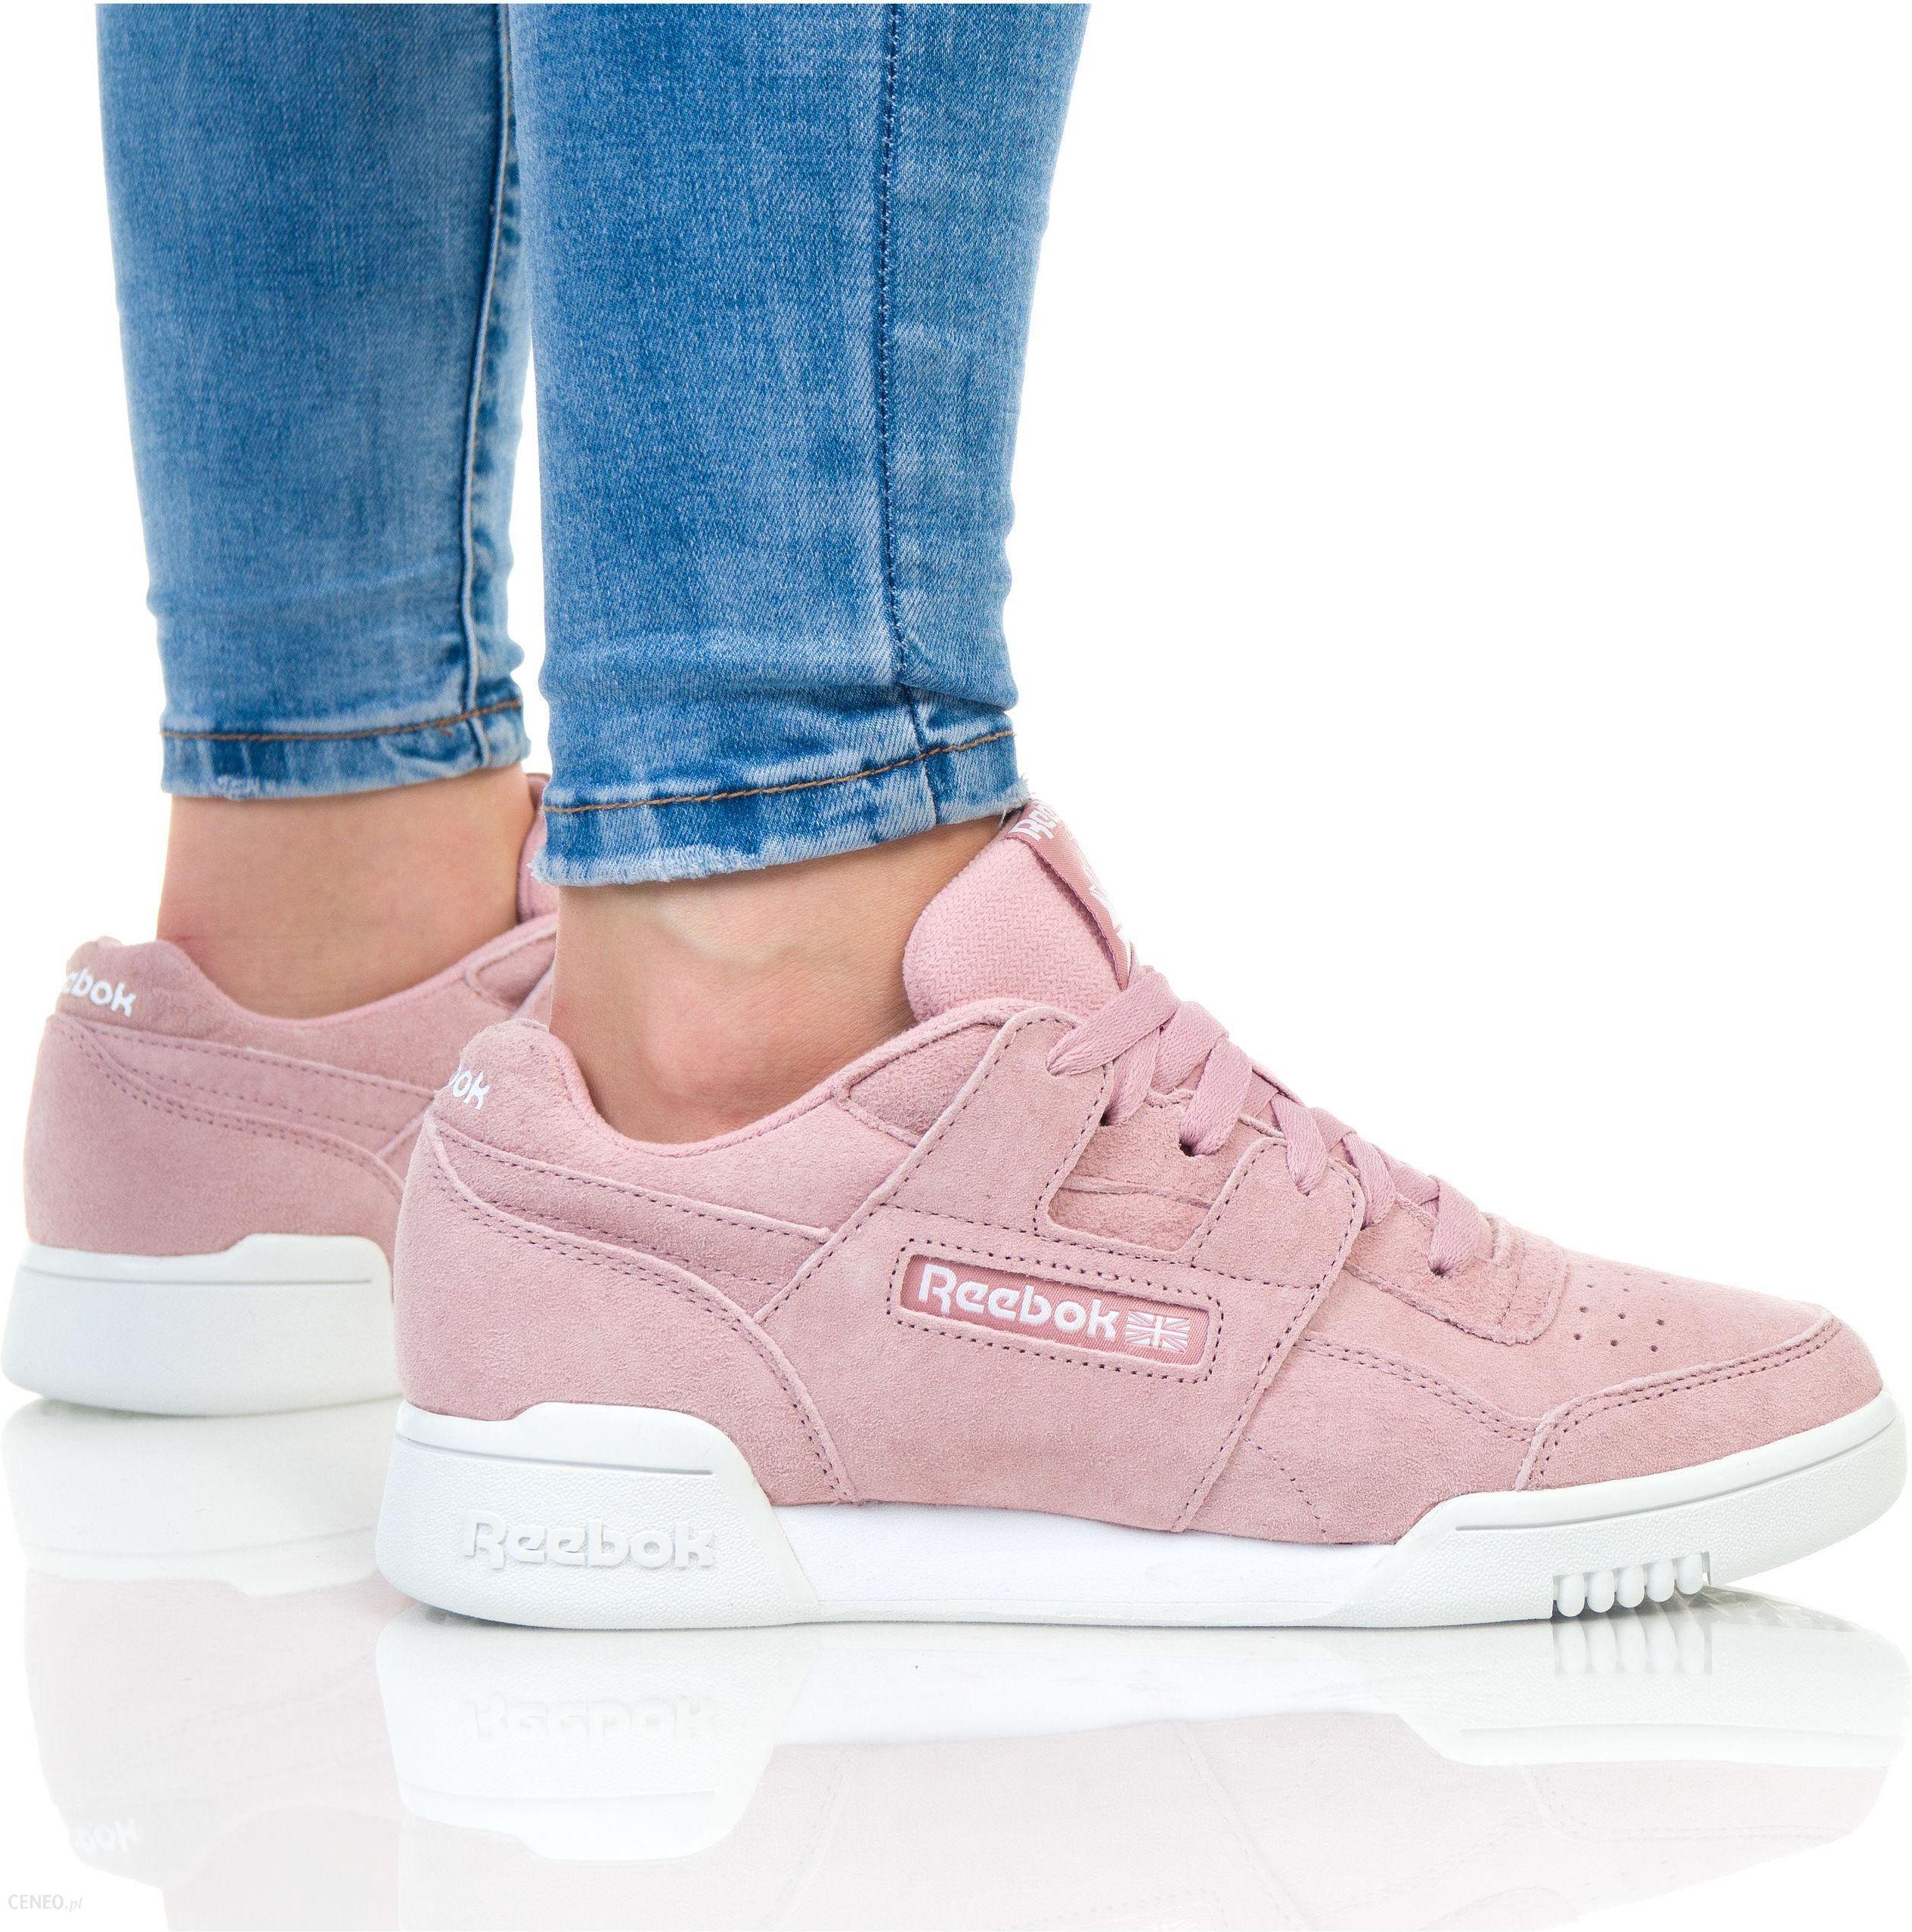 Buty Nike Damskie Nike Air Max Tn BiałySrebro